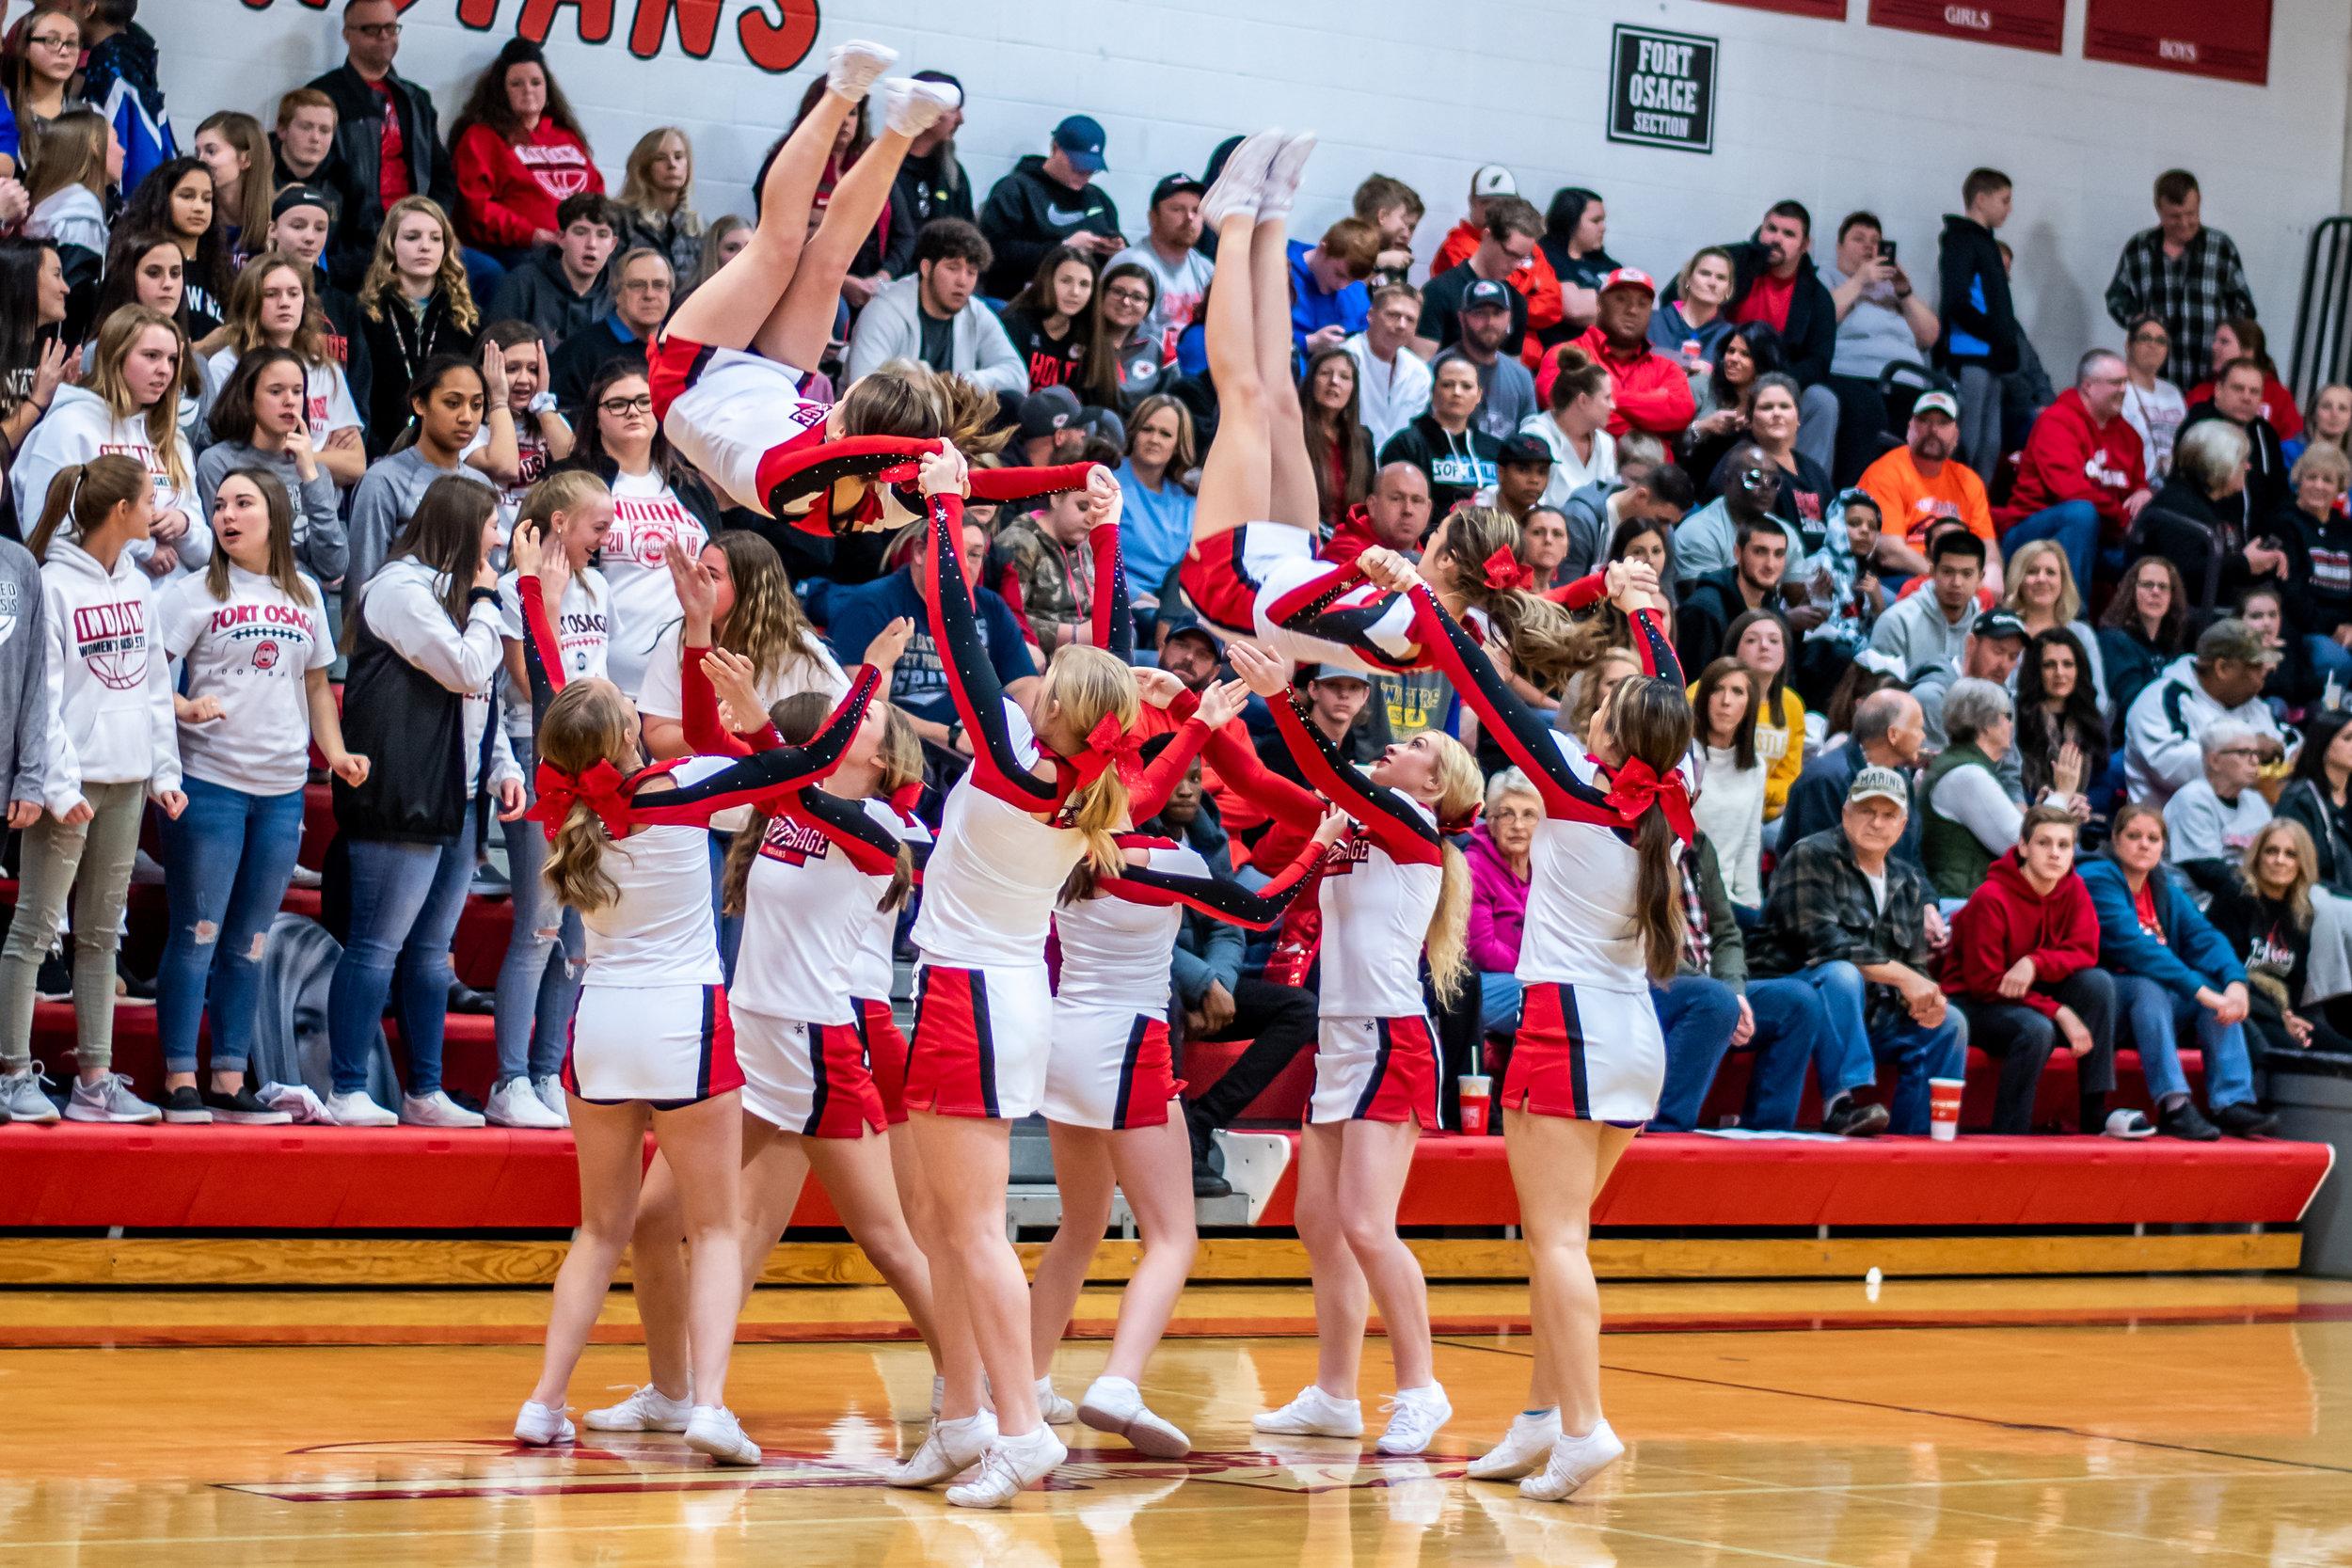 fort-osage-basketball-girls-boys-cheer-indianettes-35-of-95_31705469677_o.jpg